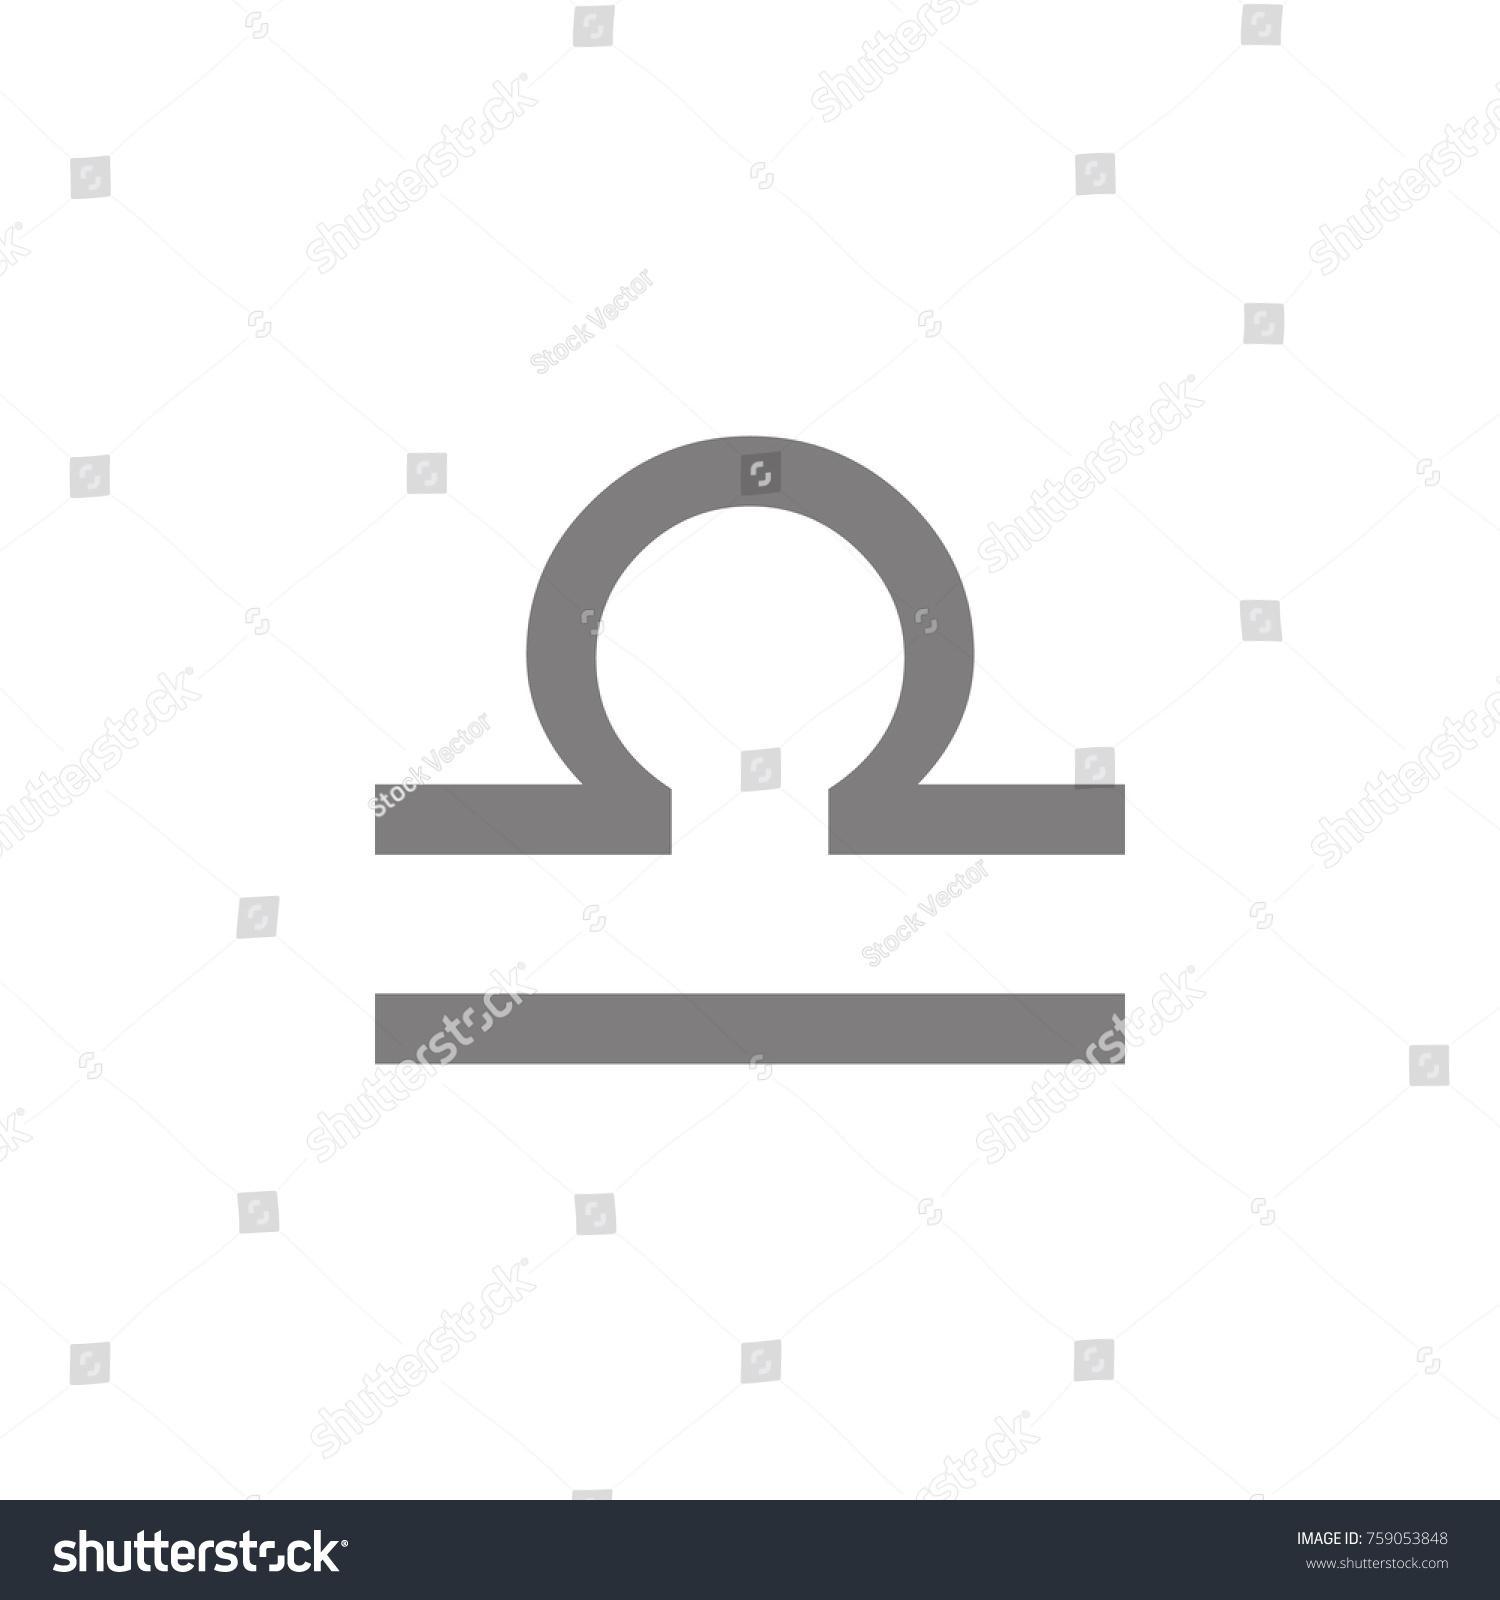 Libra icon symbol scales icon web stock vector 759053848 libra icon symbol scales icon web element premium quality graphic design signs symbols biocorpaavc Choice Image